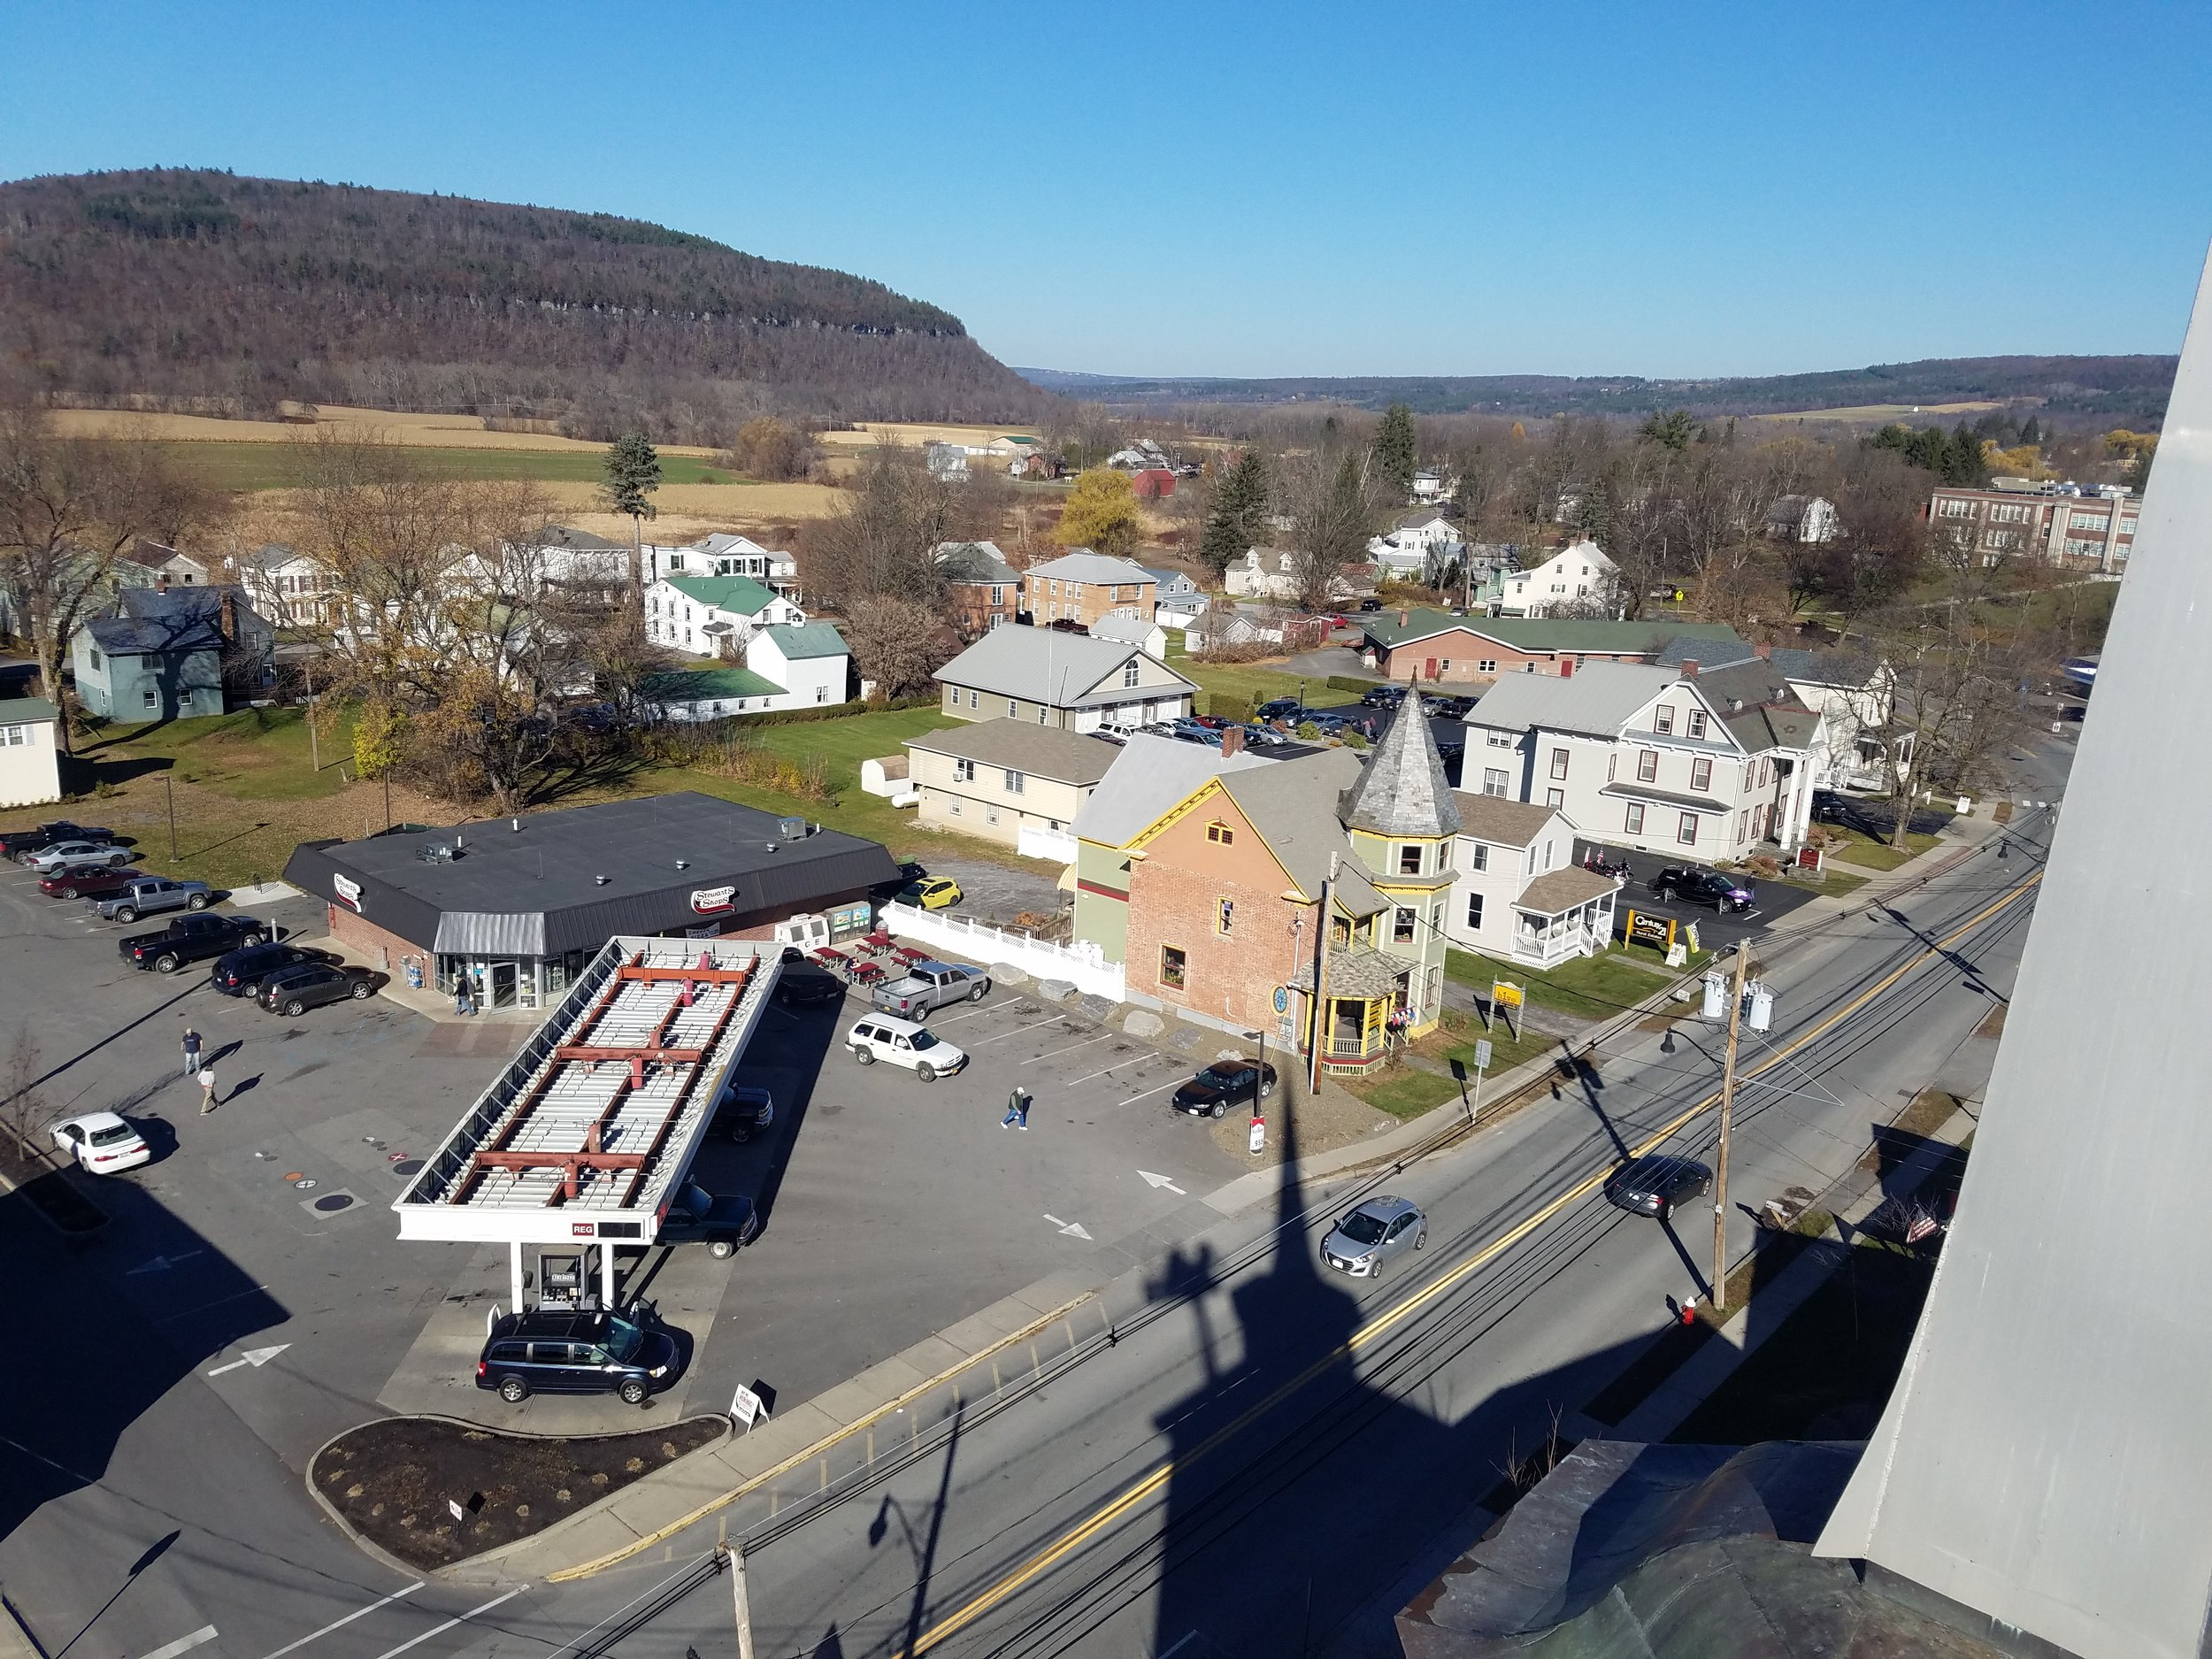 View from 85 Feet 2016.jpg